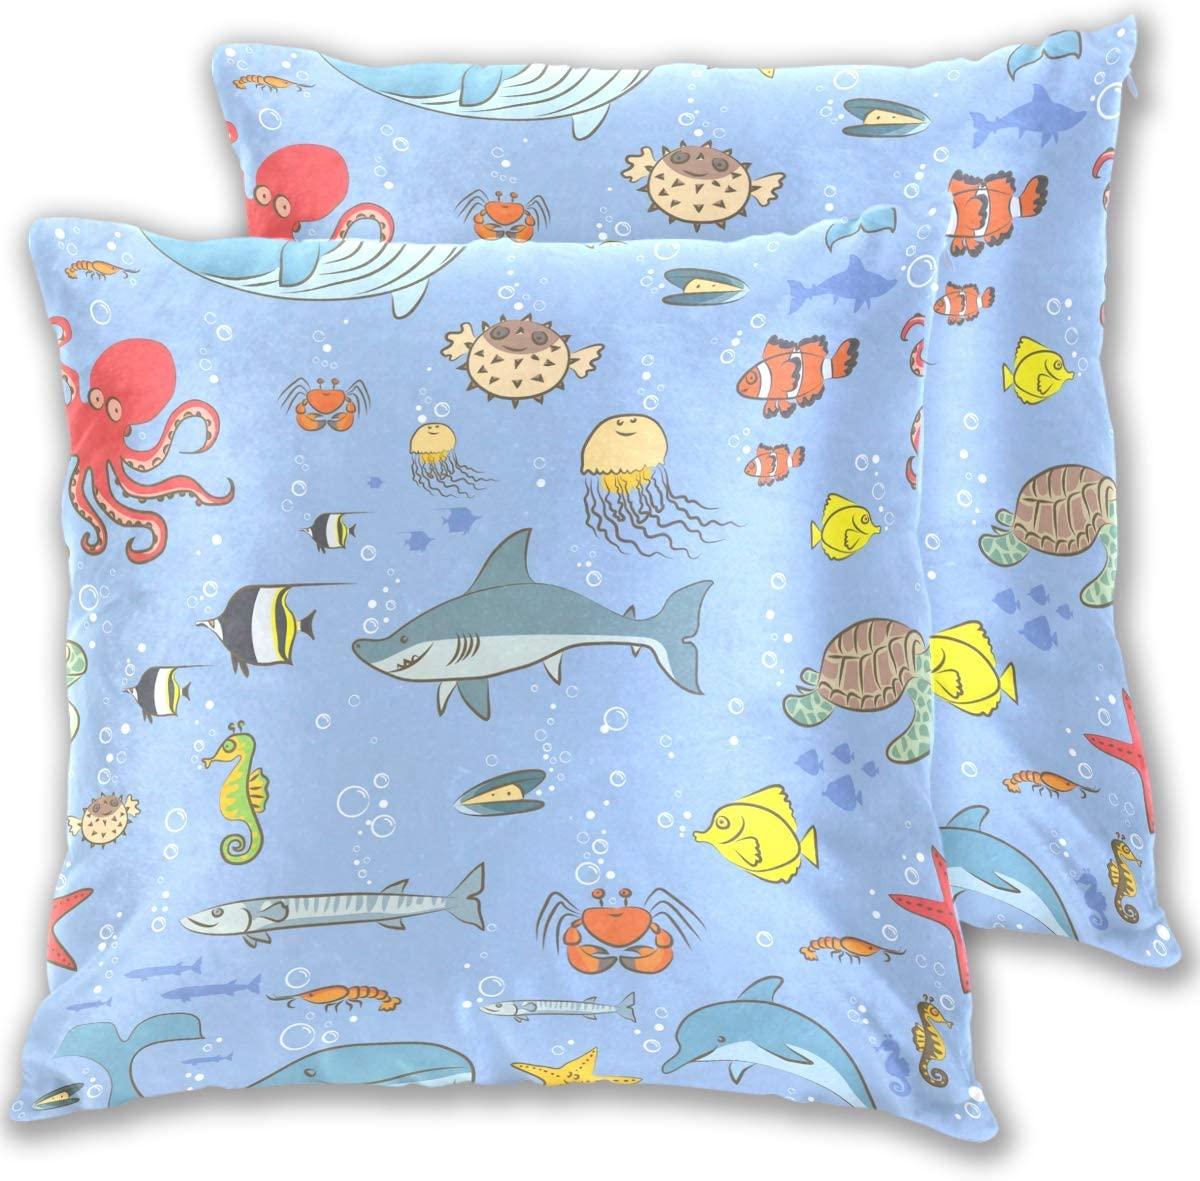 senya Pack of 2, Velvet Soft Decorative Square Throw Pillow Covers Set Blue Shark Fishes Cushion Case for Sofa Bedroom Car 18 x 18 Inch(l)